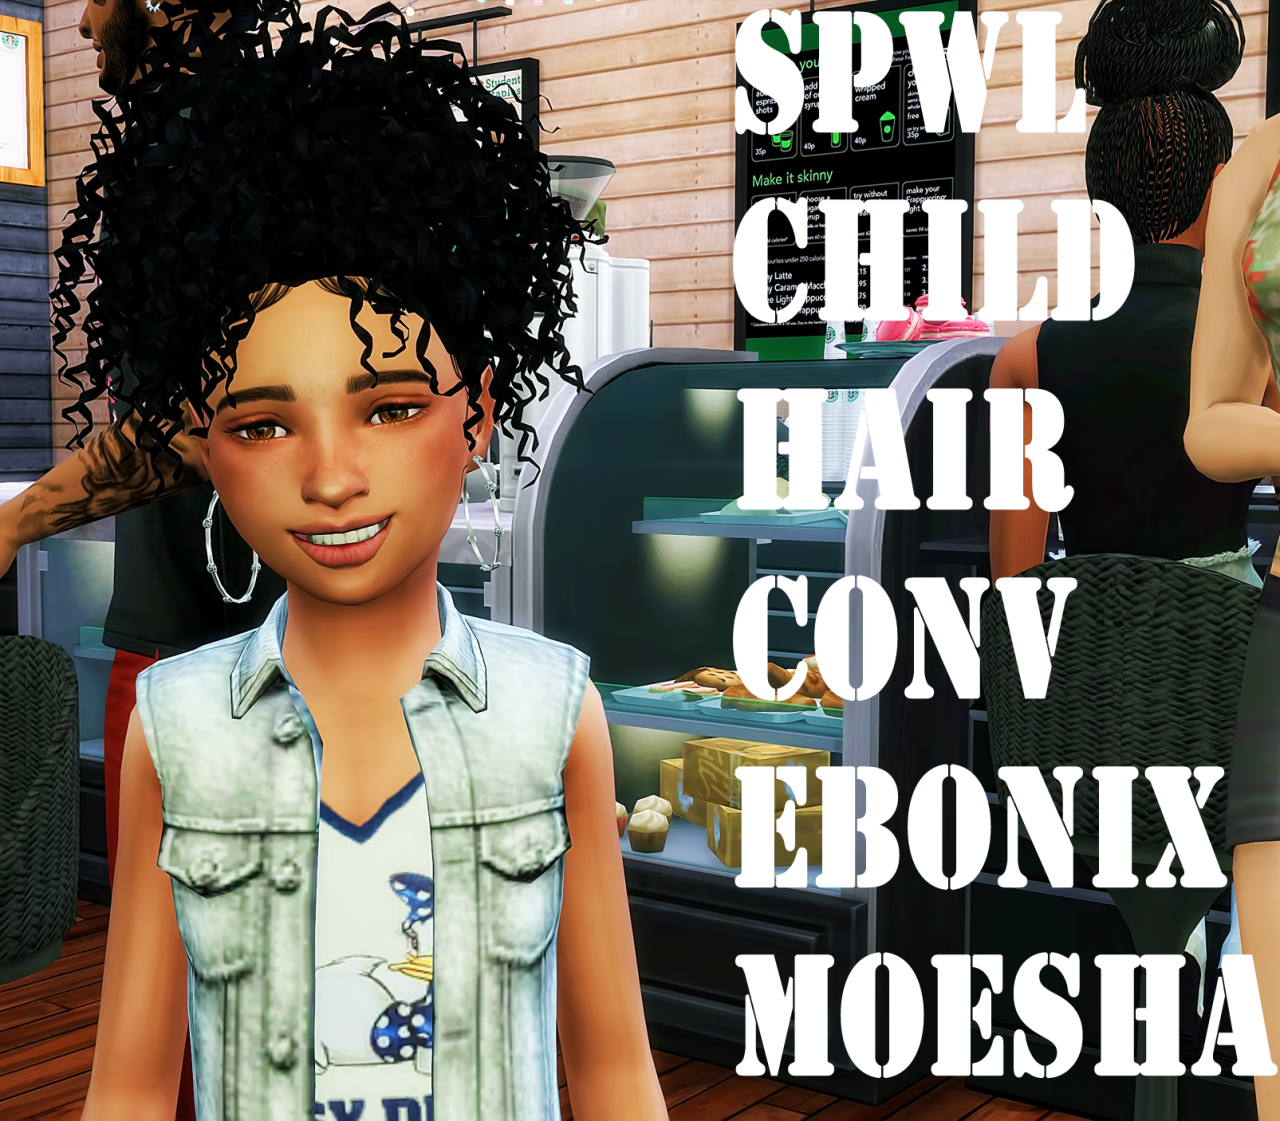 Lana Cc Finds Spwl Cf Ebonix Moesha Hair Ts4 Hair